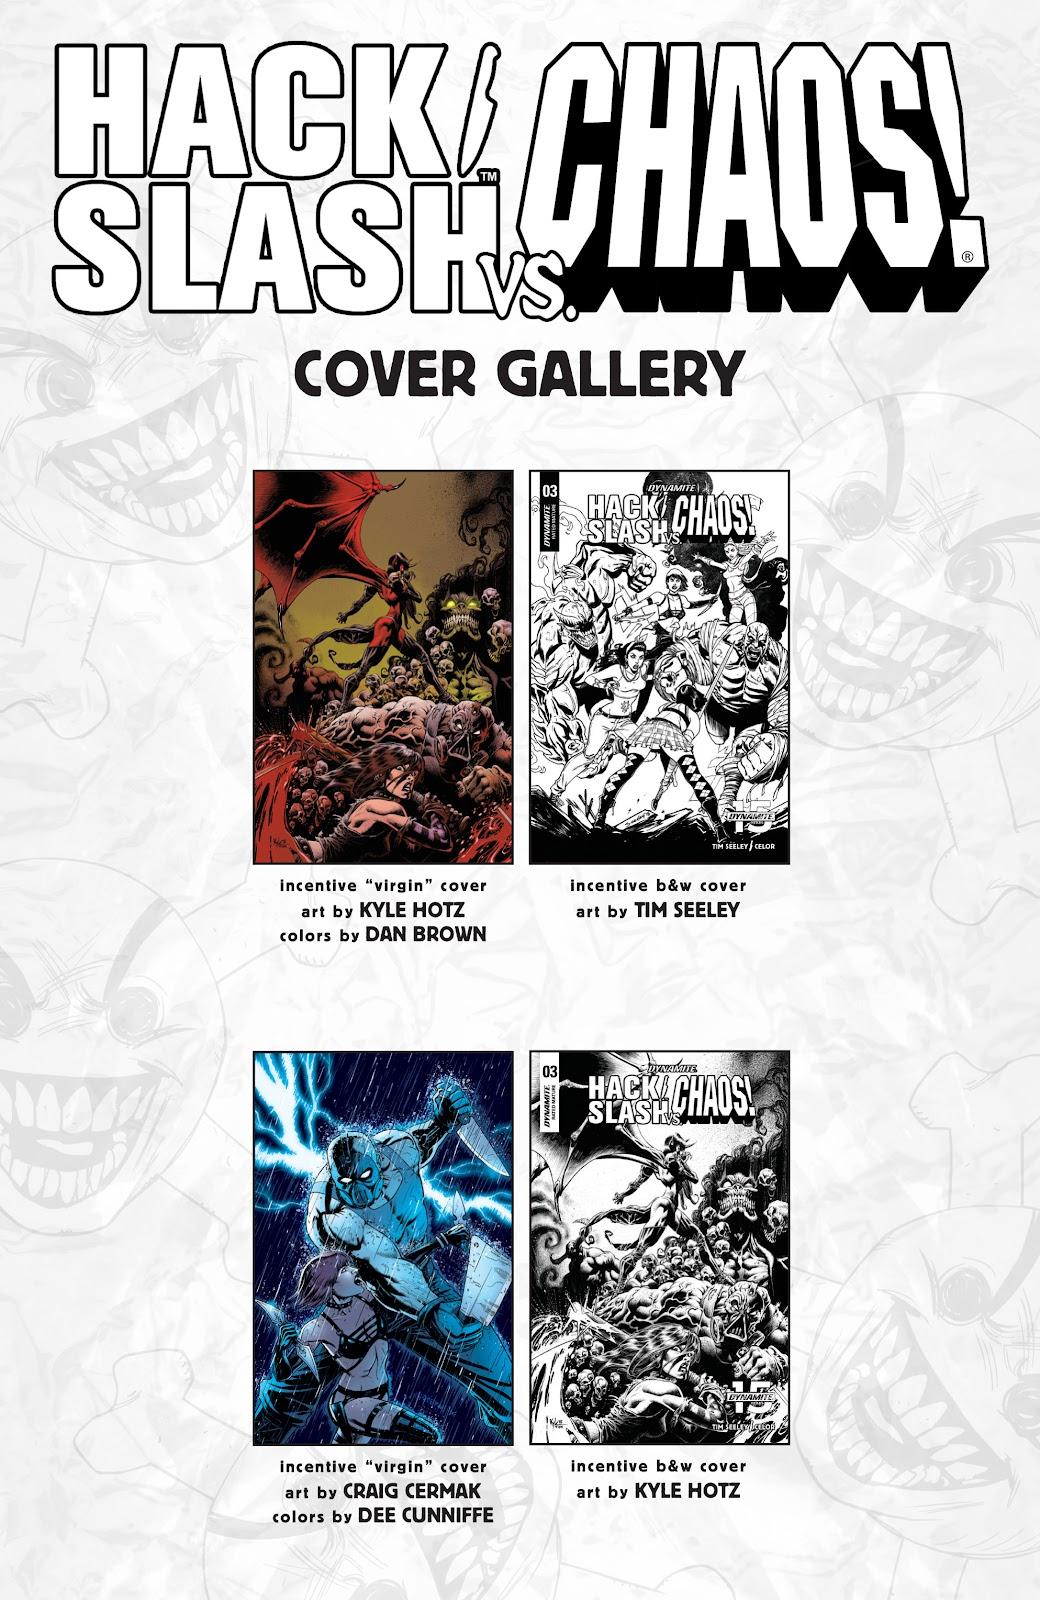 Read online Hack/Slash vs. Chaos comic -  Issue #3 - 28